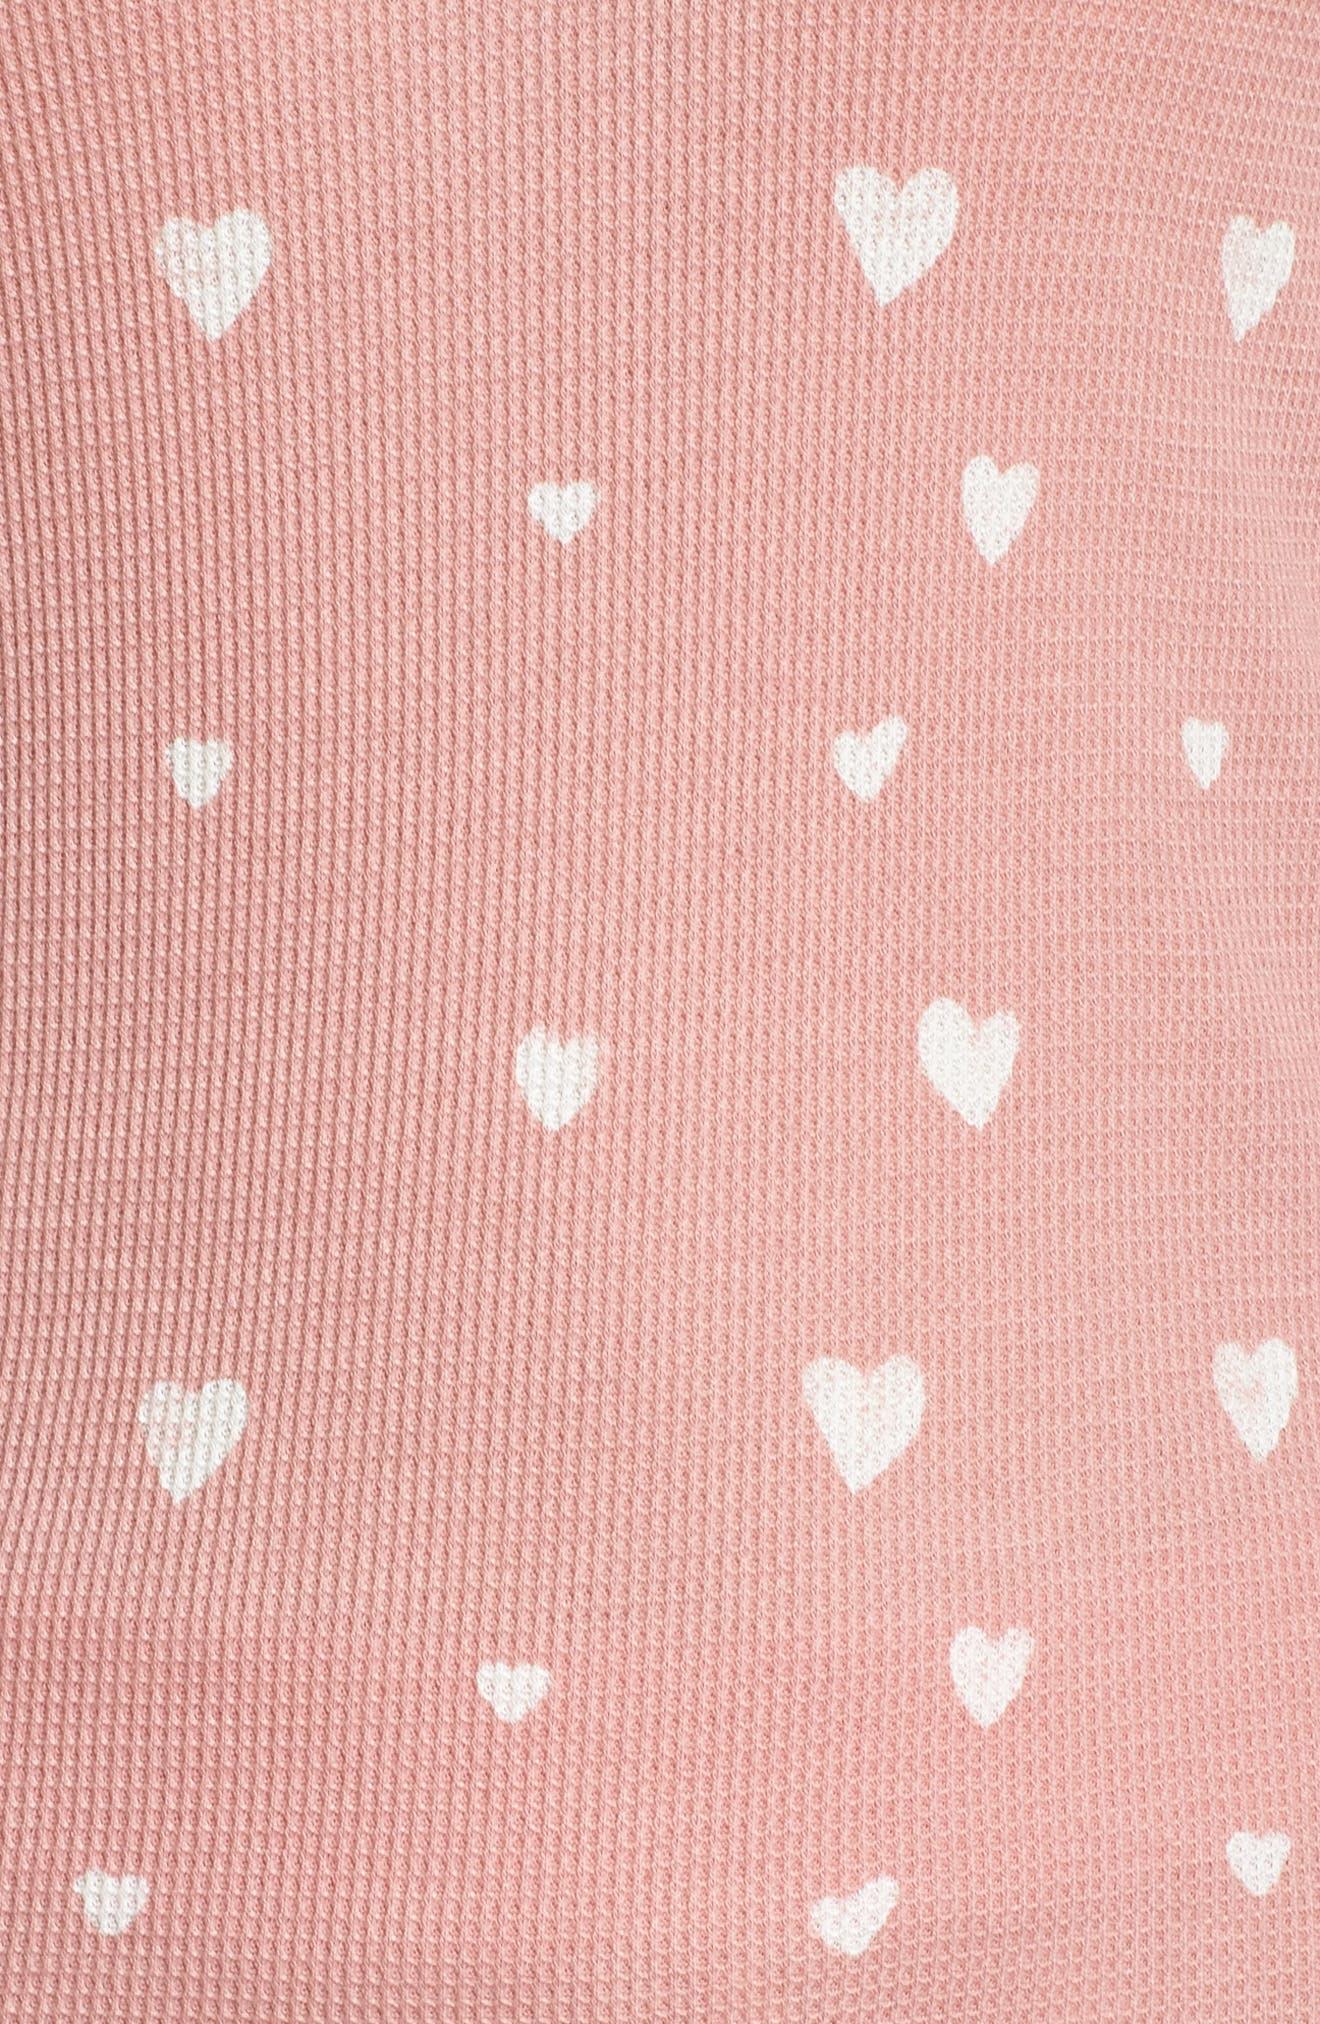 RETROSPECTIVE CO., Thermal Pajamas, Alternate thumbnail 5, color, 650